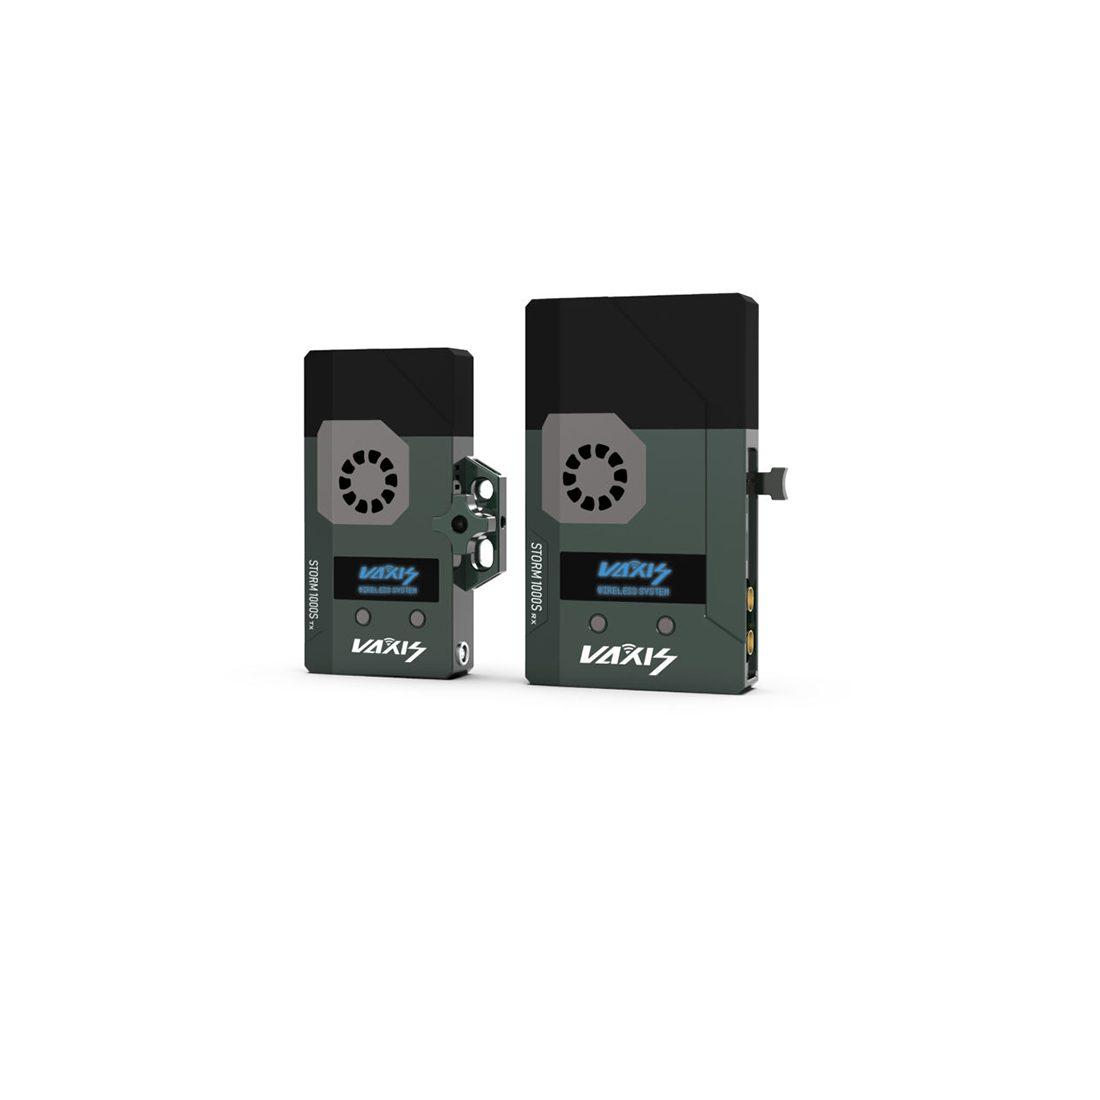 wireless transmitter receiver HD video